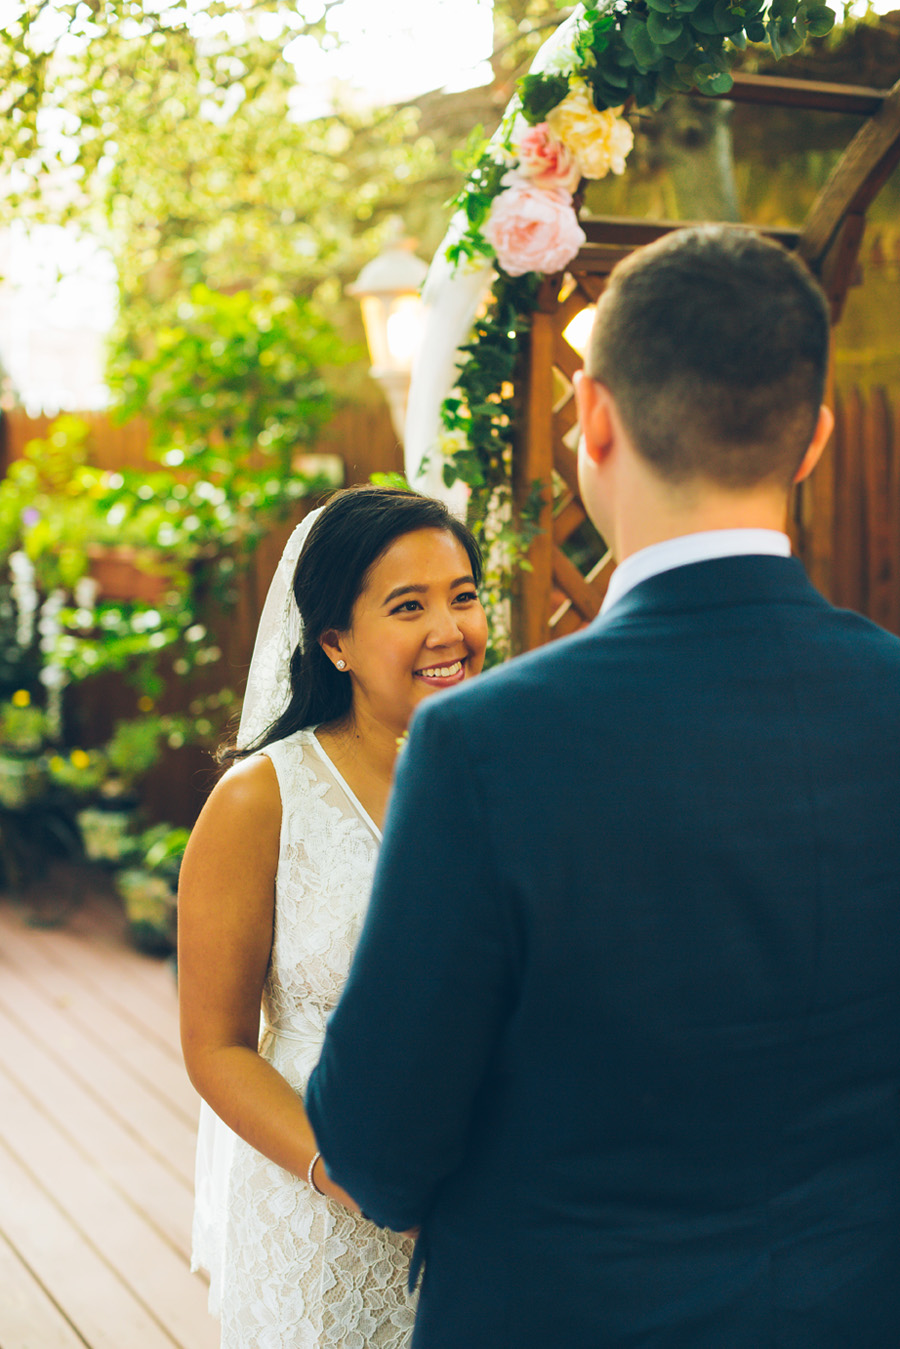 POOH-PETER-NYC-WEDDING-CEREMONY-CYNTHIACHUNG-0153.jpg